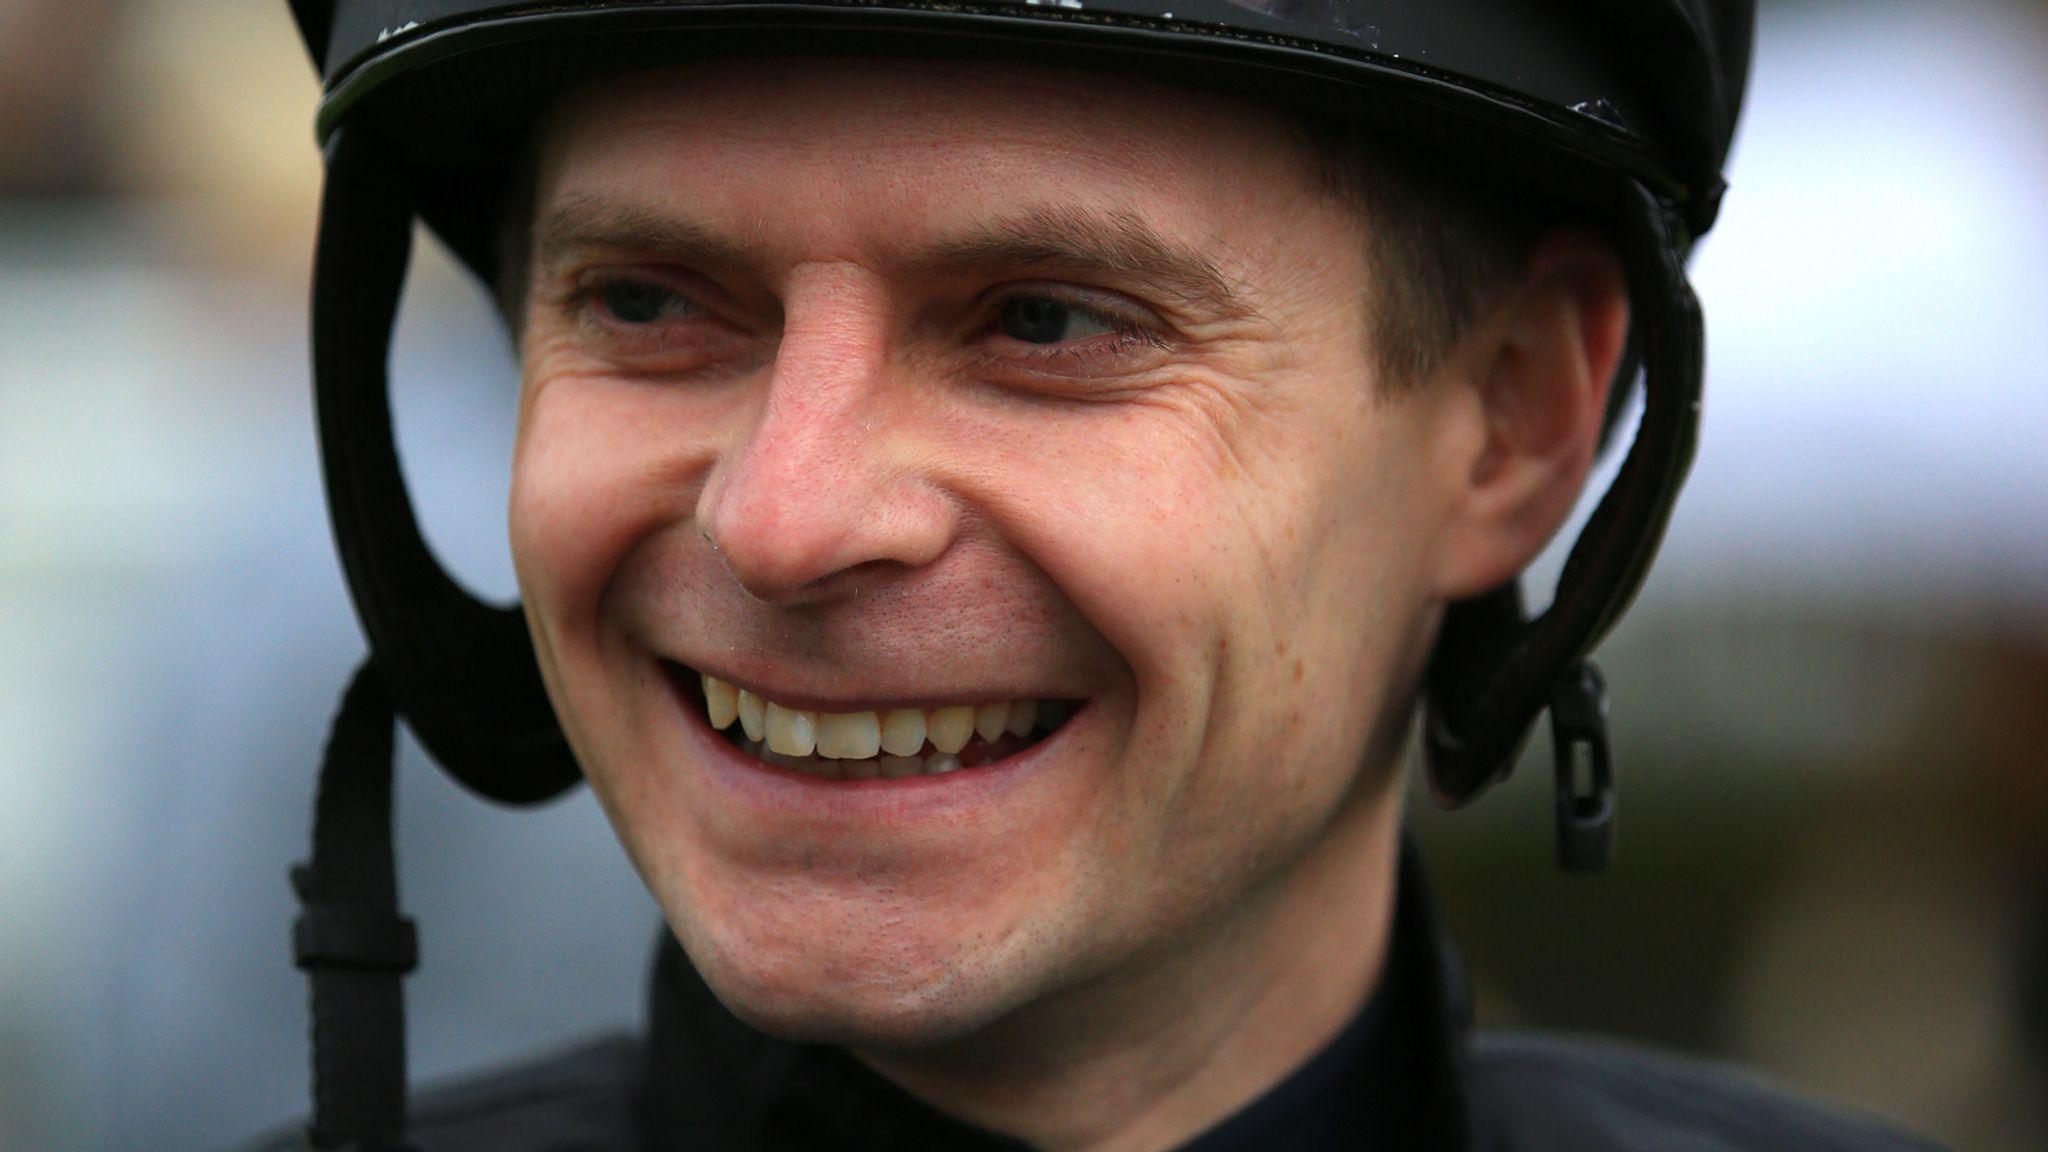 Jockey Fergus Sweeney announces retirement plans